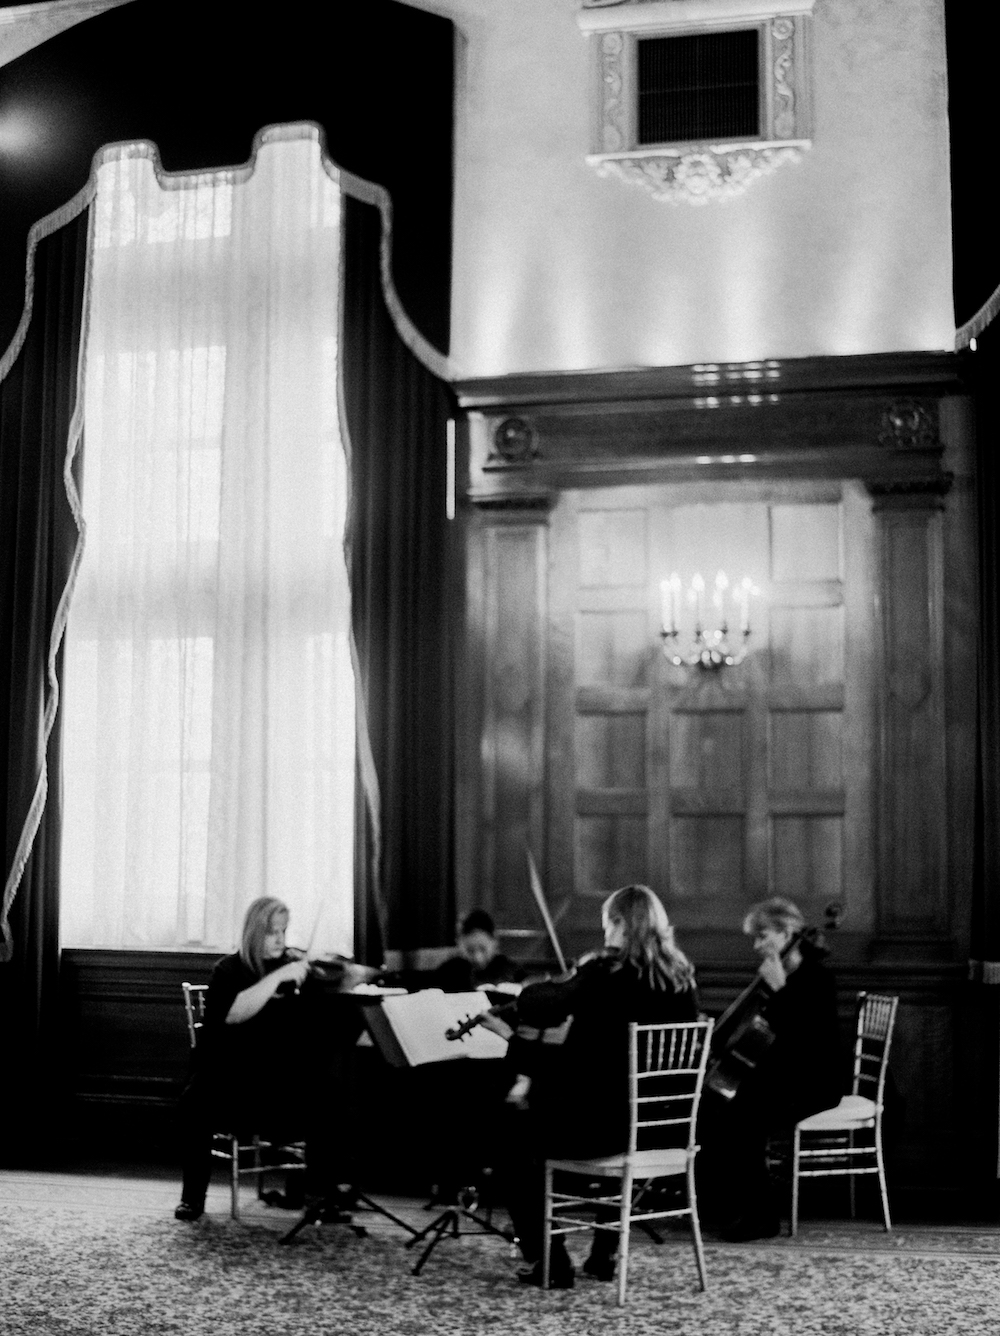 Fort Garry Hotel Wedding - Concert Ballroom Wedding